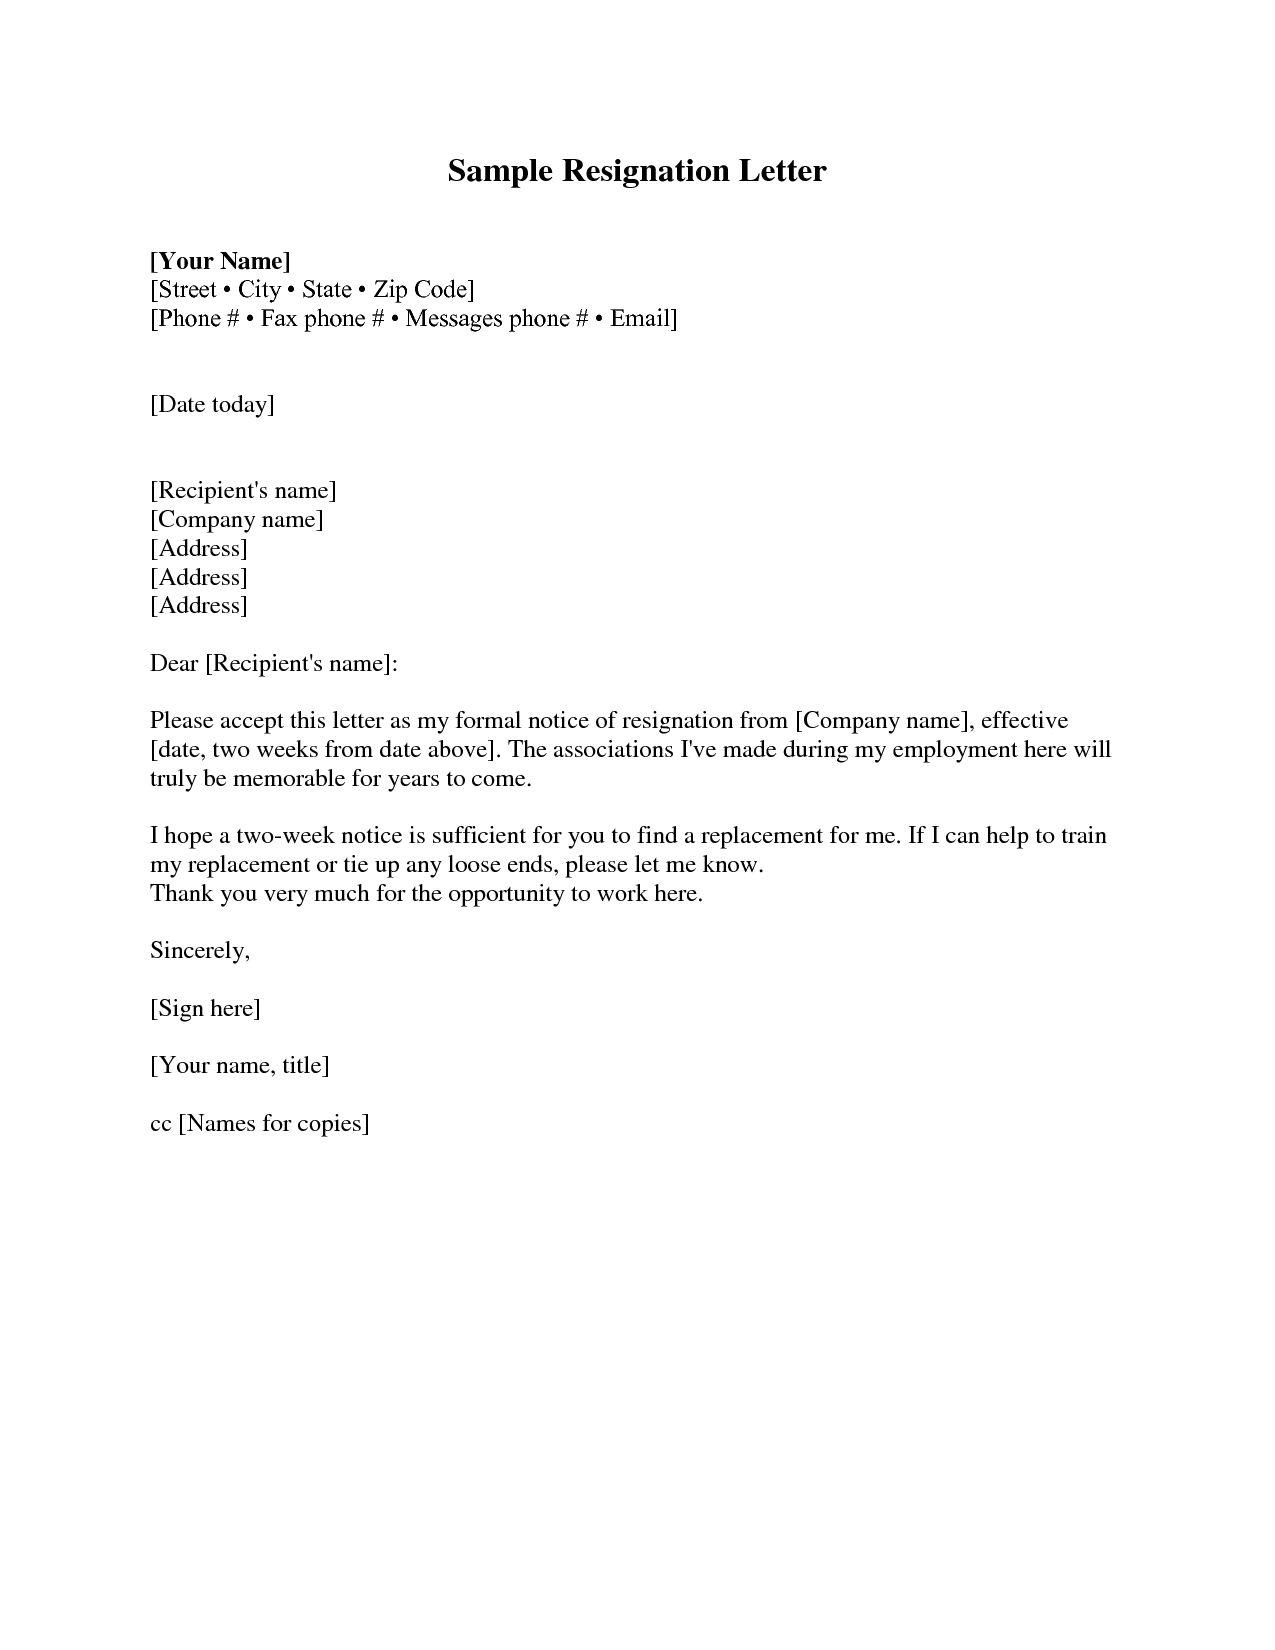 Resignation Letter 2 Weeks Notice Resignation Letter For 2 Weeks Notice Template Word Cumed Resignation Letter Sample Resignation Letter Resignation Letters